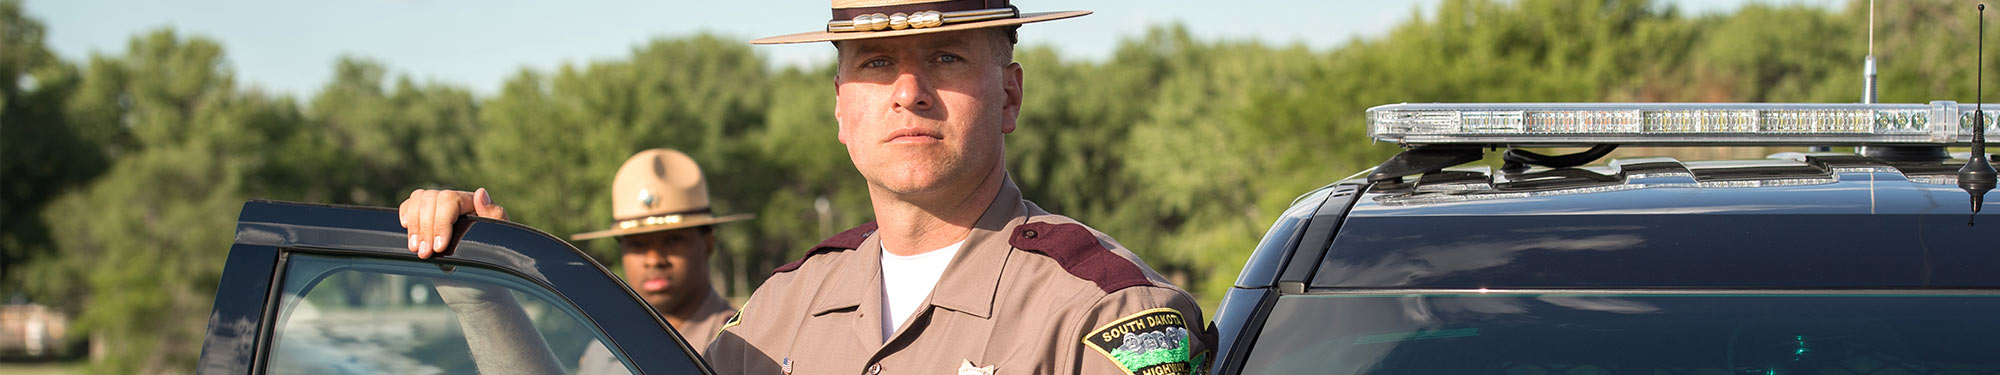 Highway Patrol Squad Map | SD DPS